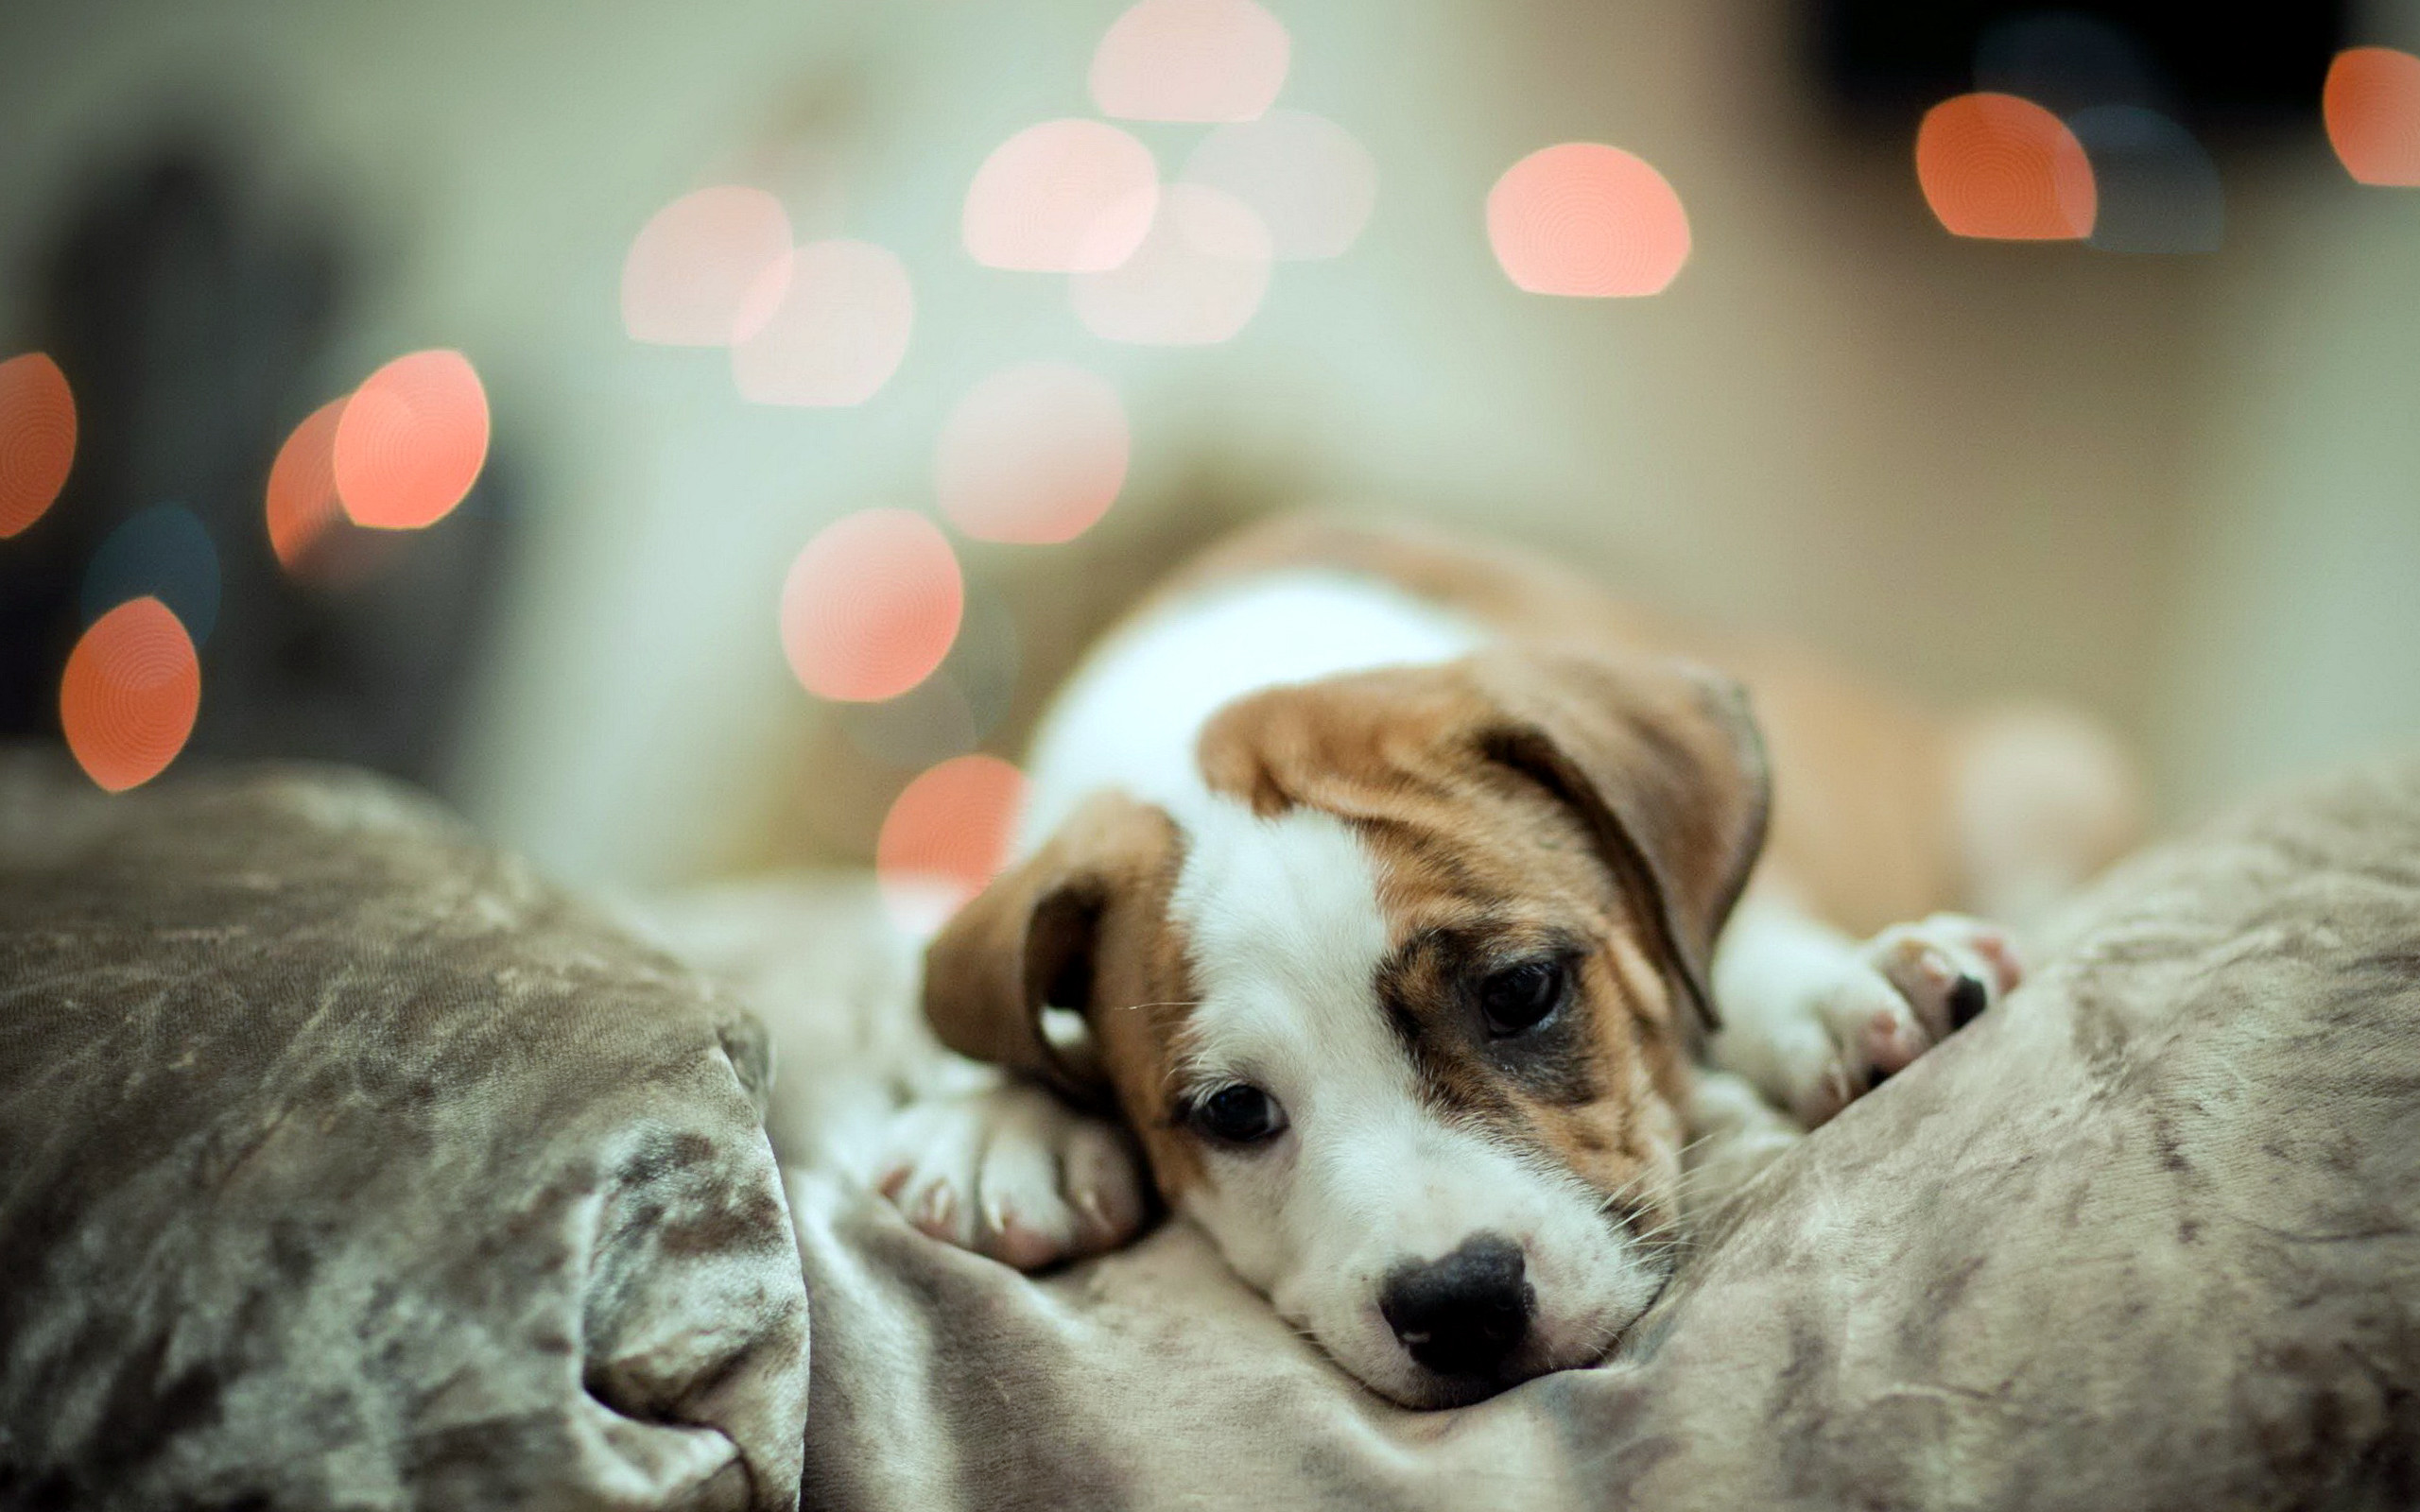 Cute Dog Sleep Wallpaper HD